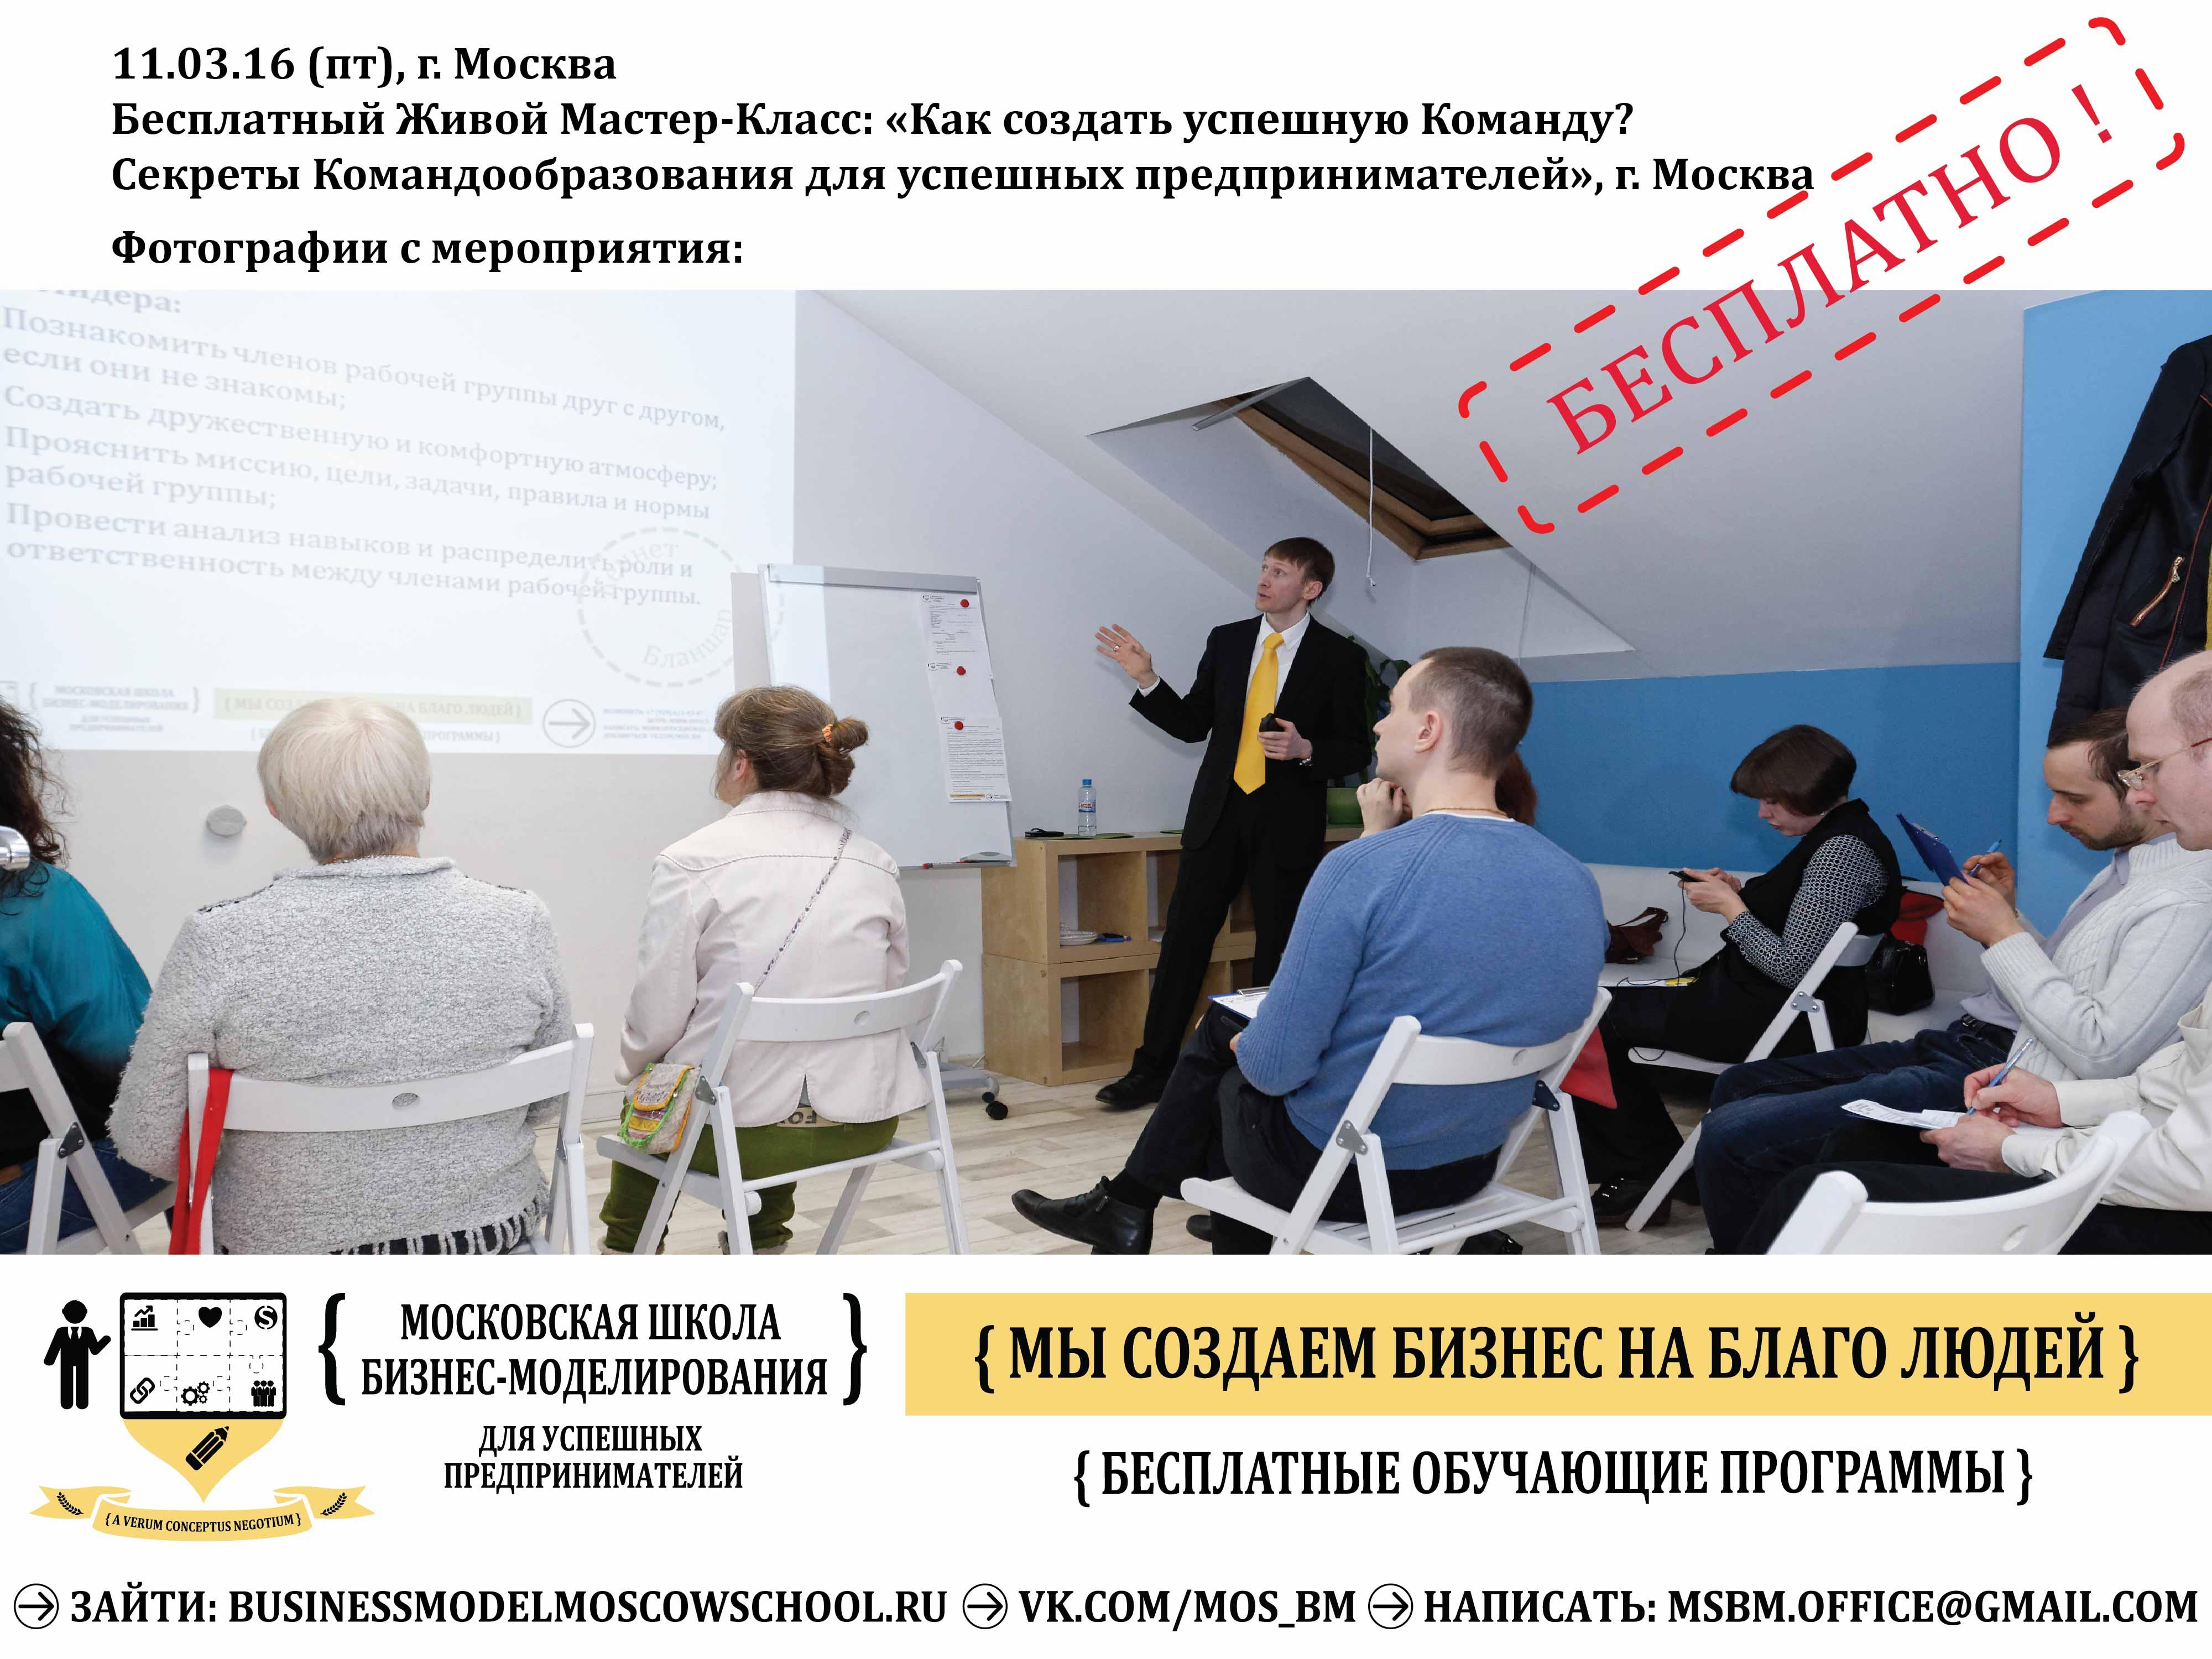 business_model_moscow_school_mclass_photo-11.03.16-3.